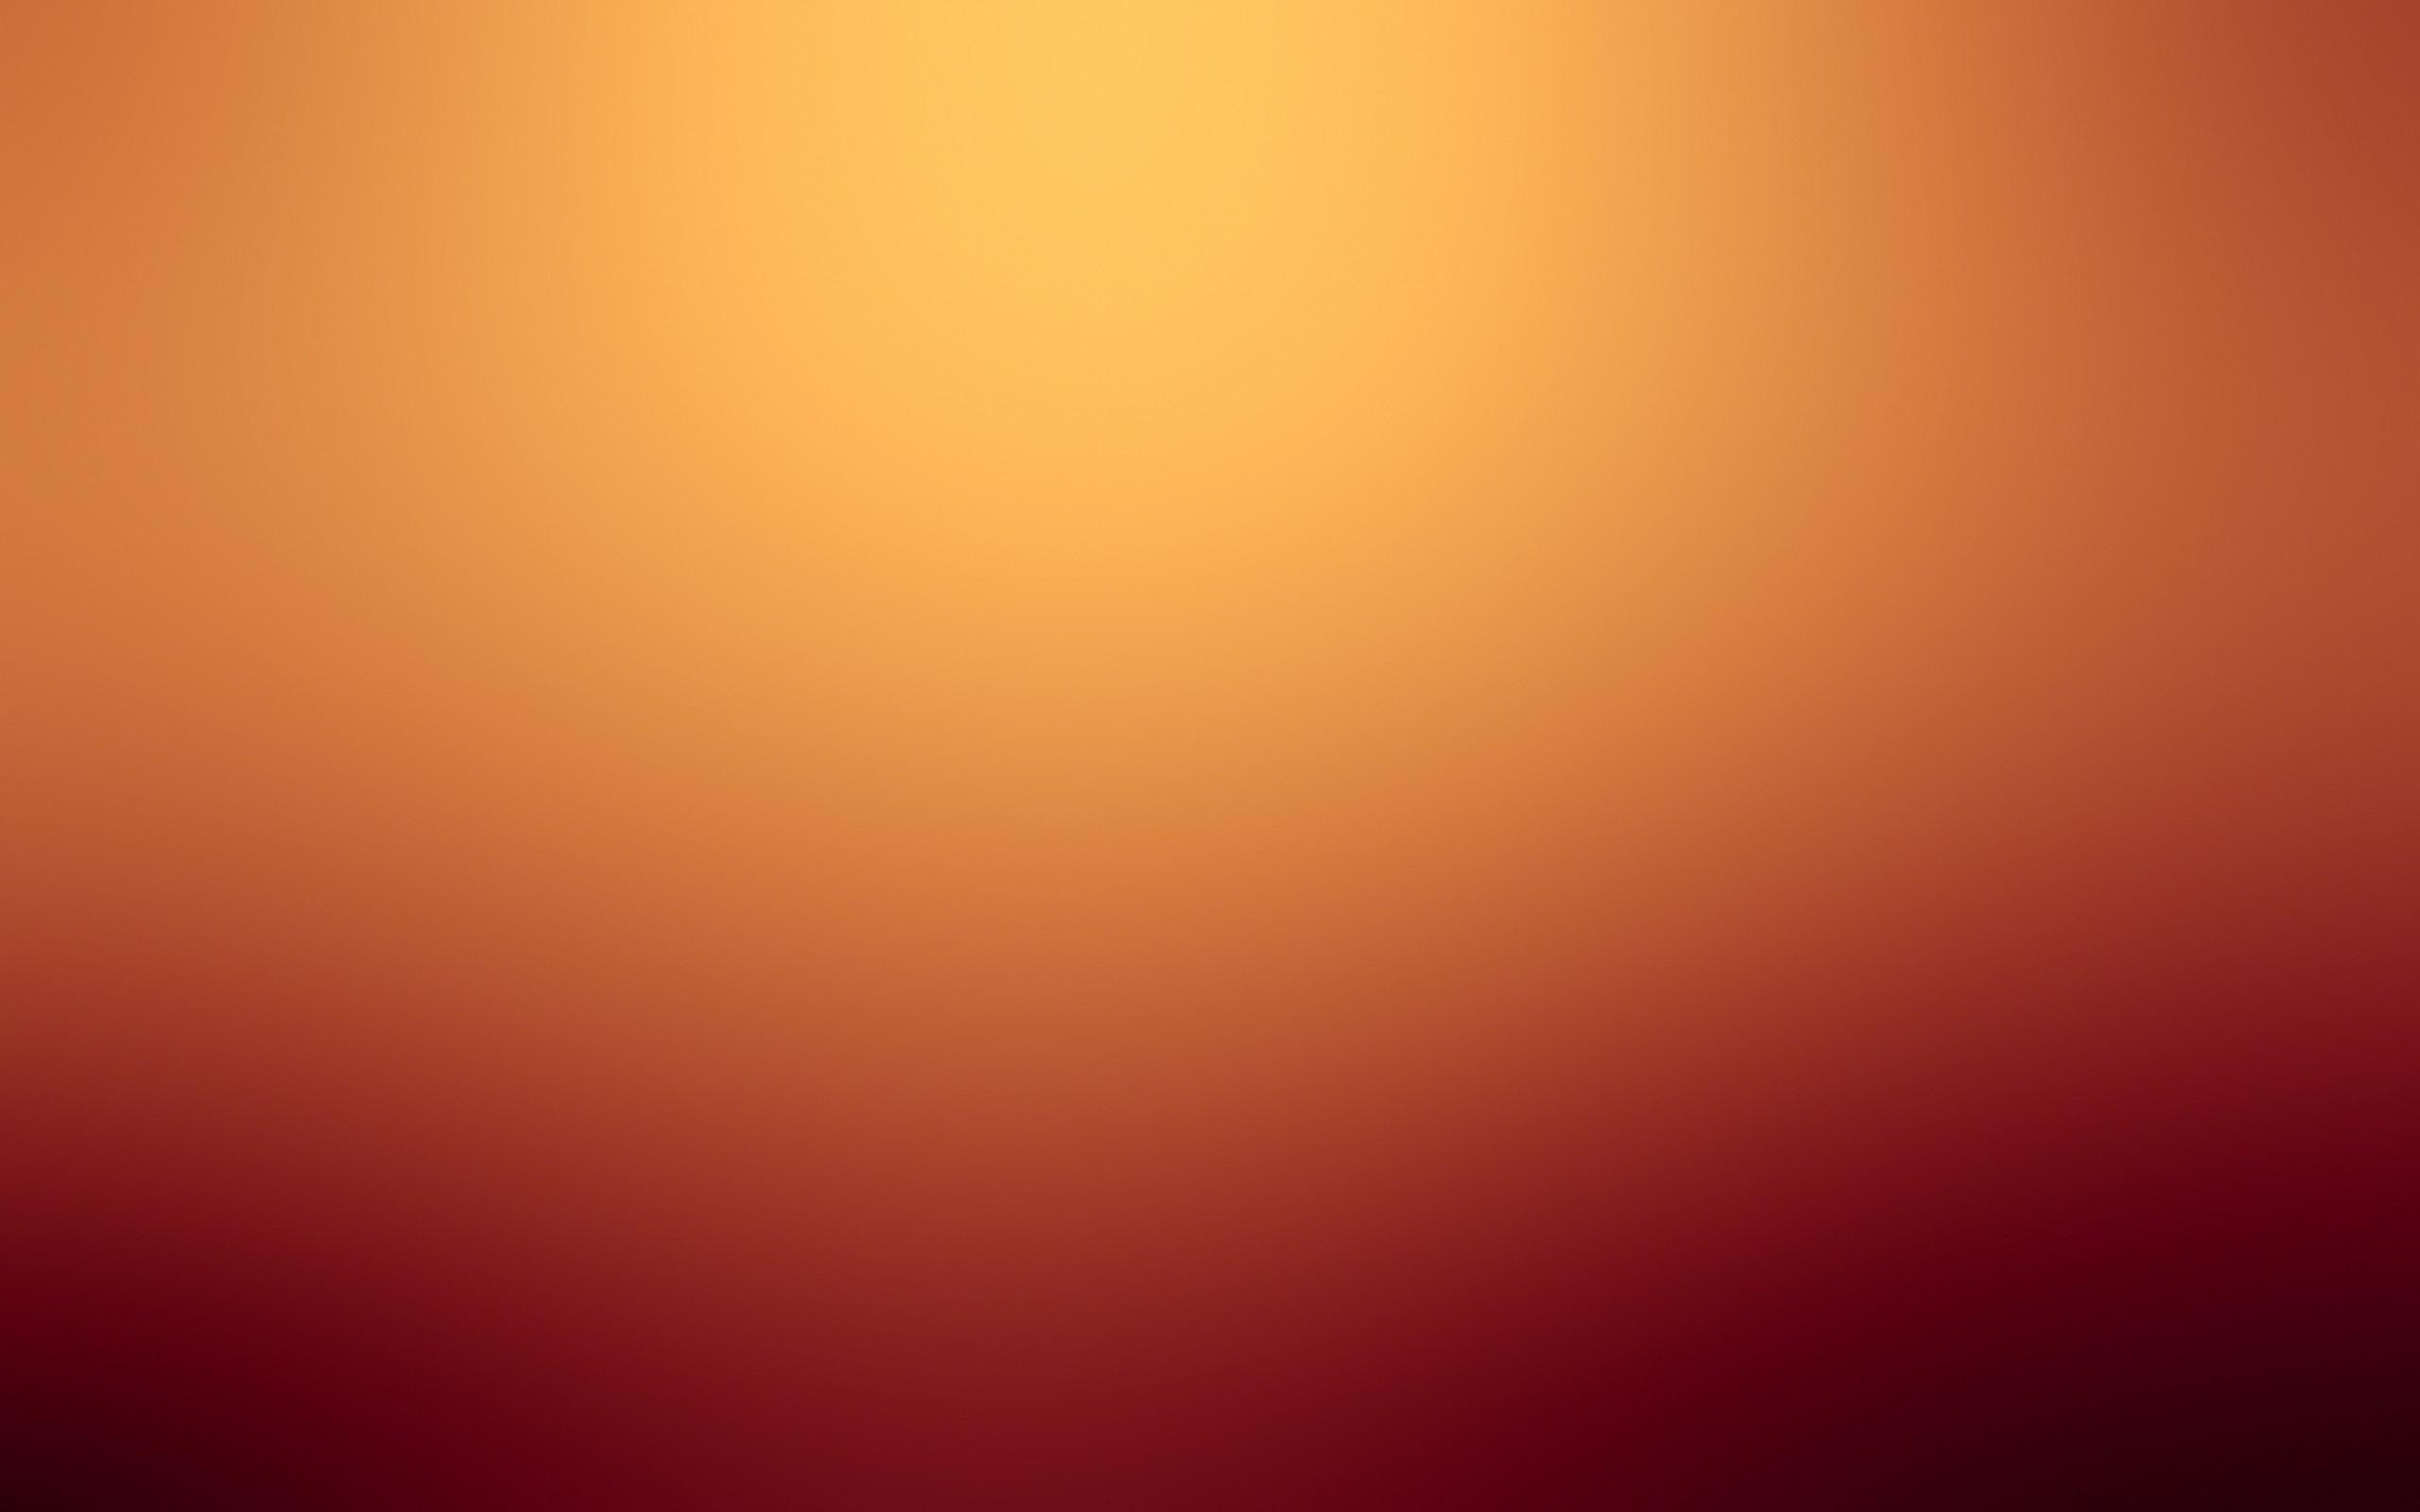 Orange Desktop Backgrounds